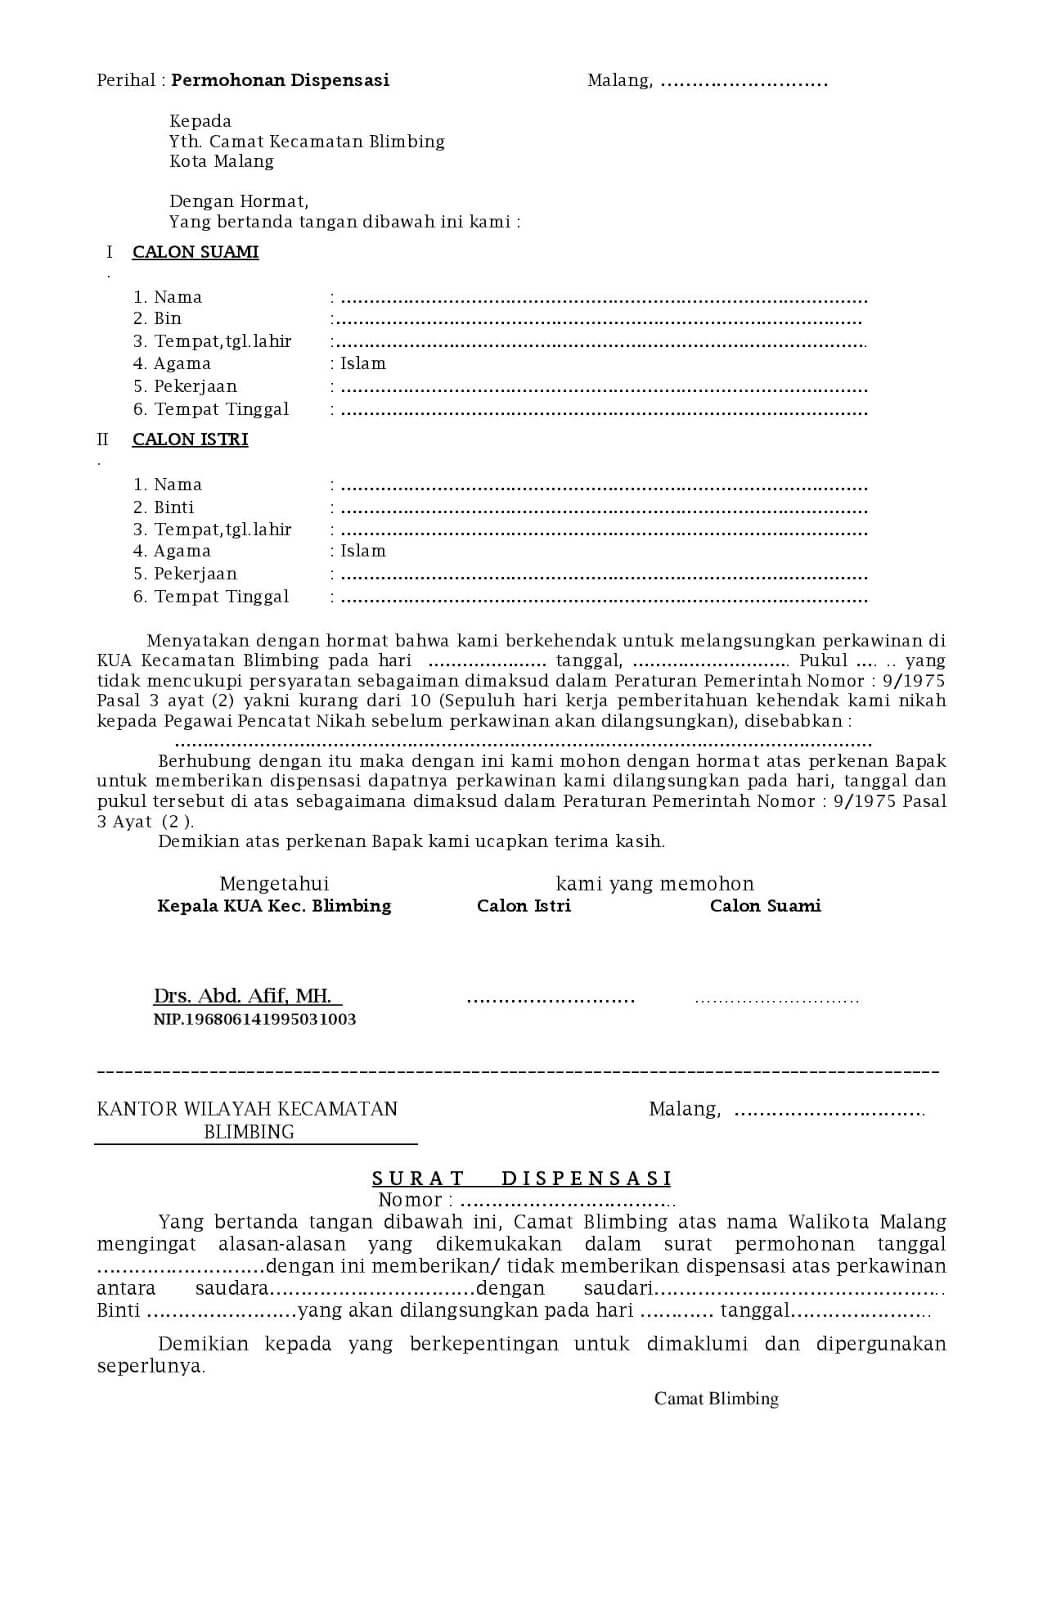 Contoh Surat Permohonan Dispensasi Nikah